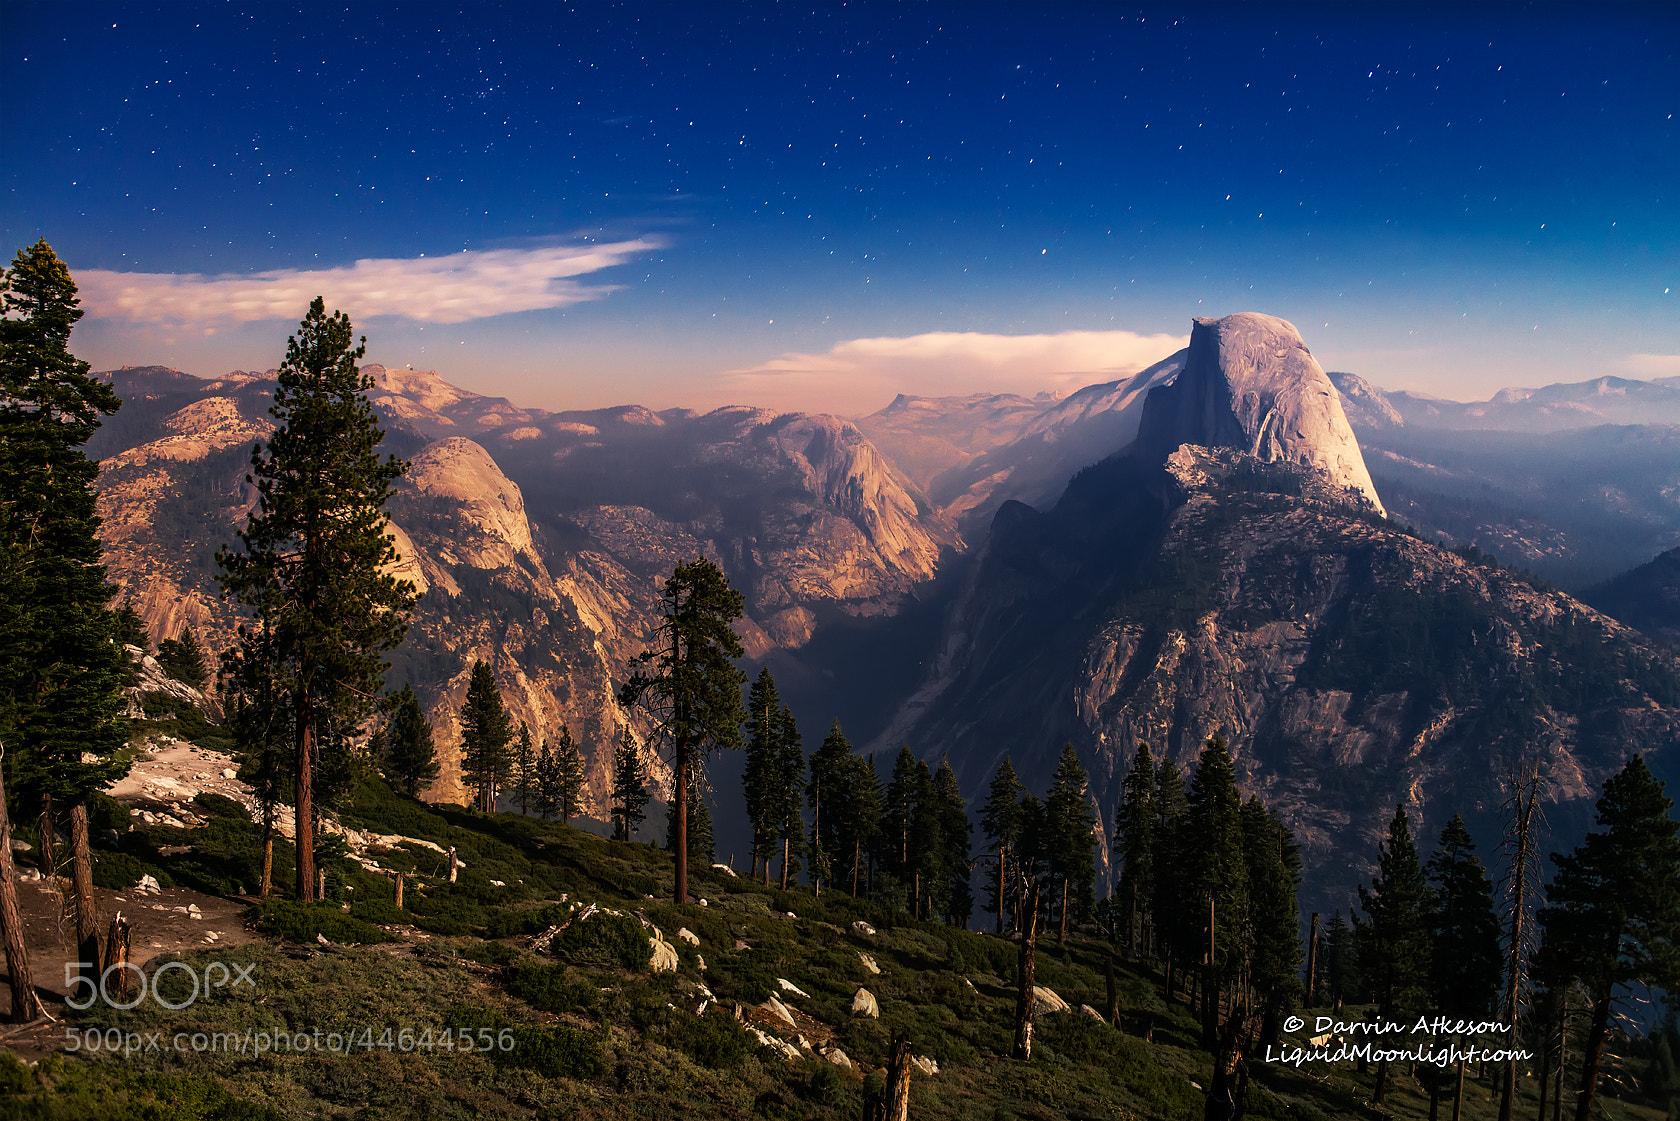 Photograph Yosemite Haze by Darvin Atkeson on 500px